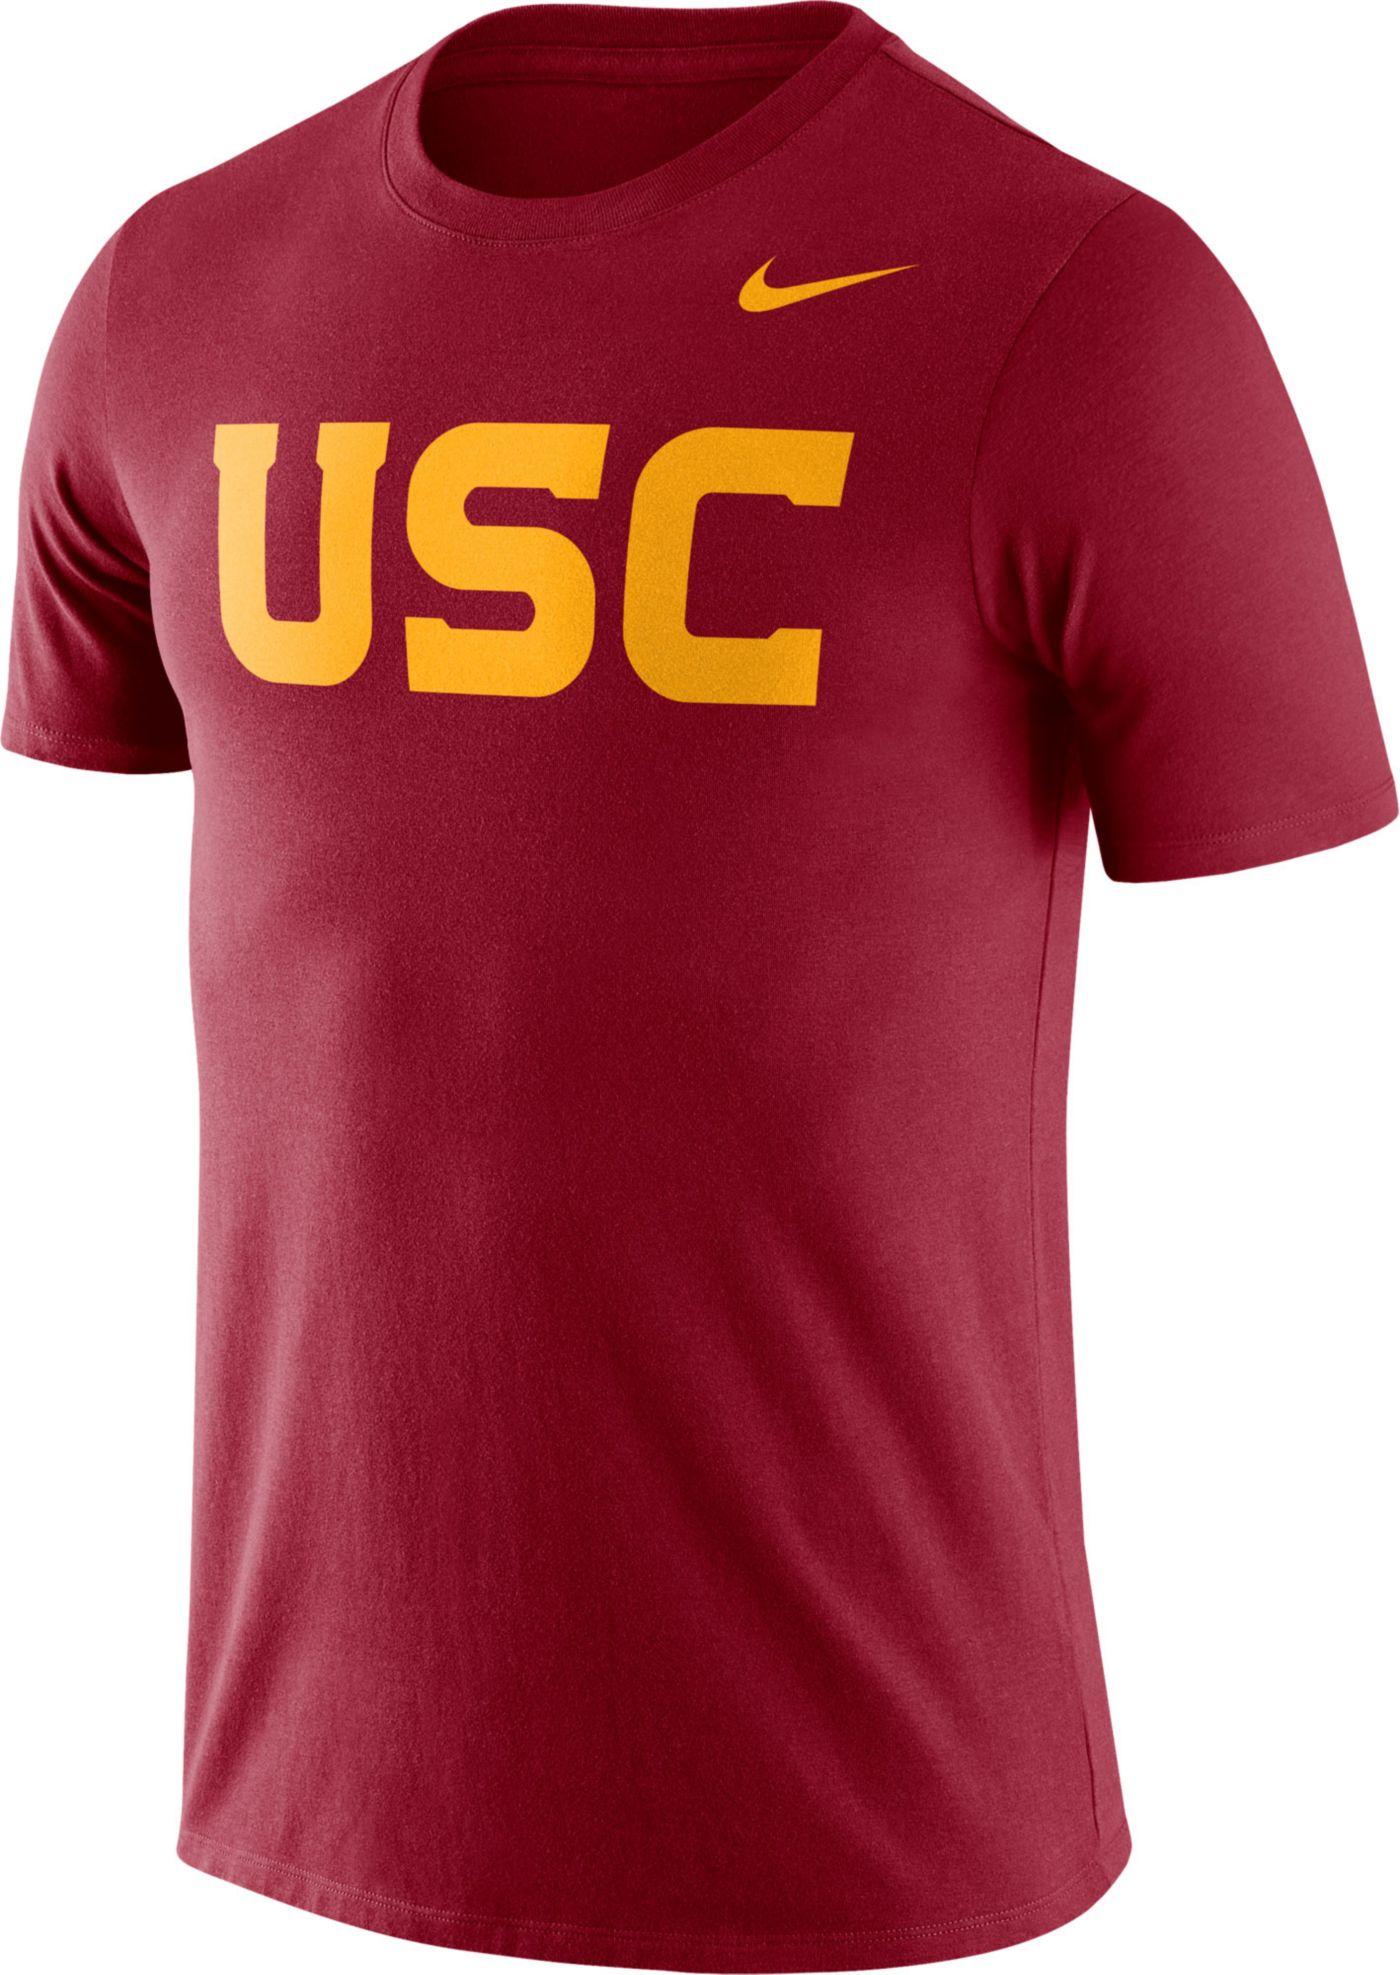 Nike Men's USC Trojans Cardinal Dri-FIT Cotton Word T-Shirt